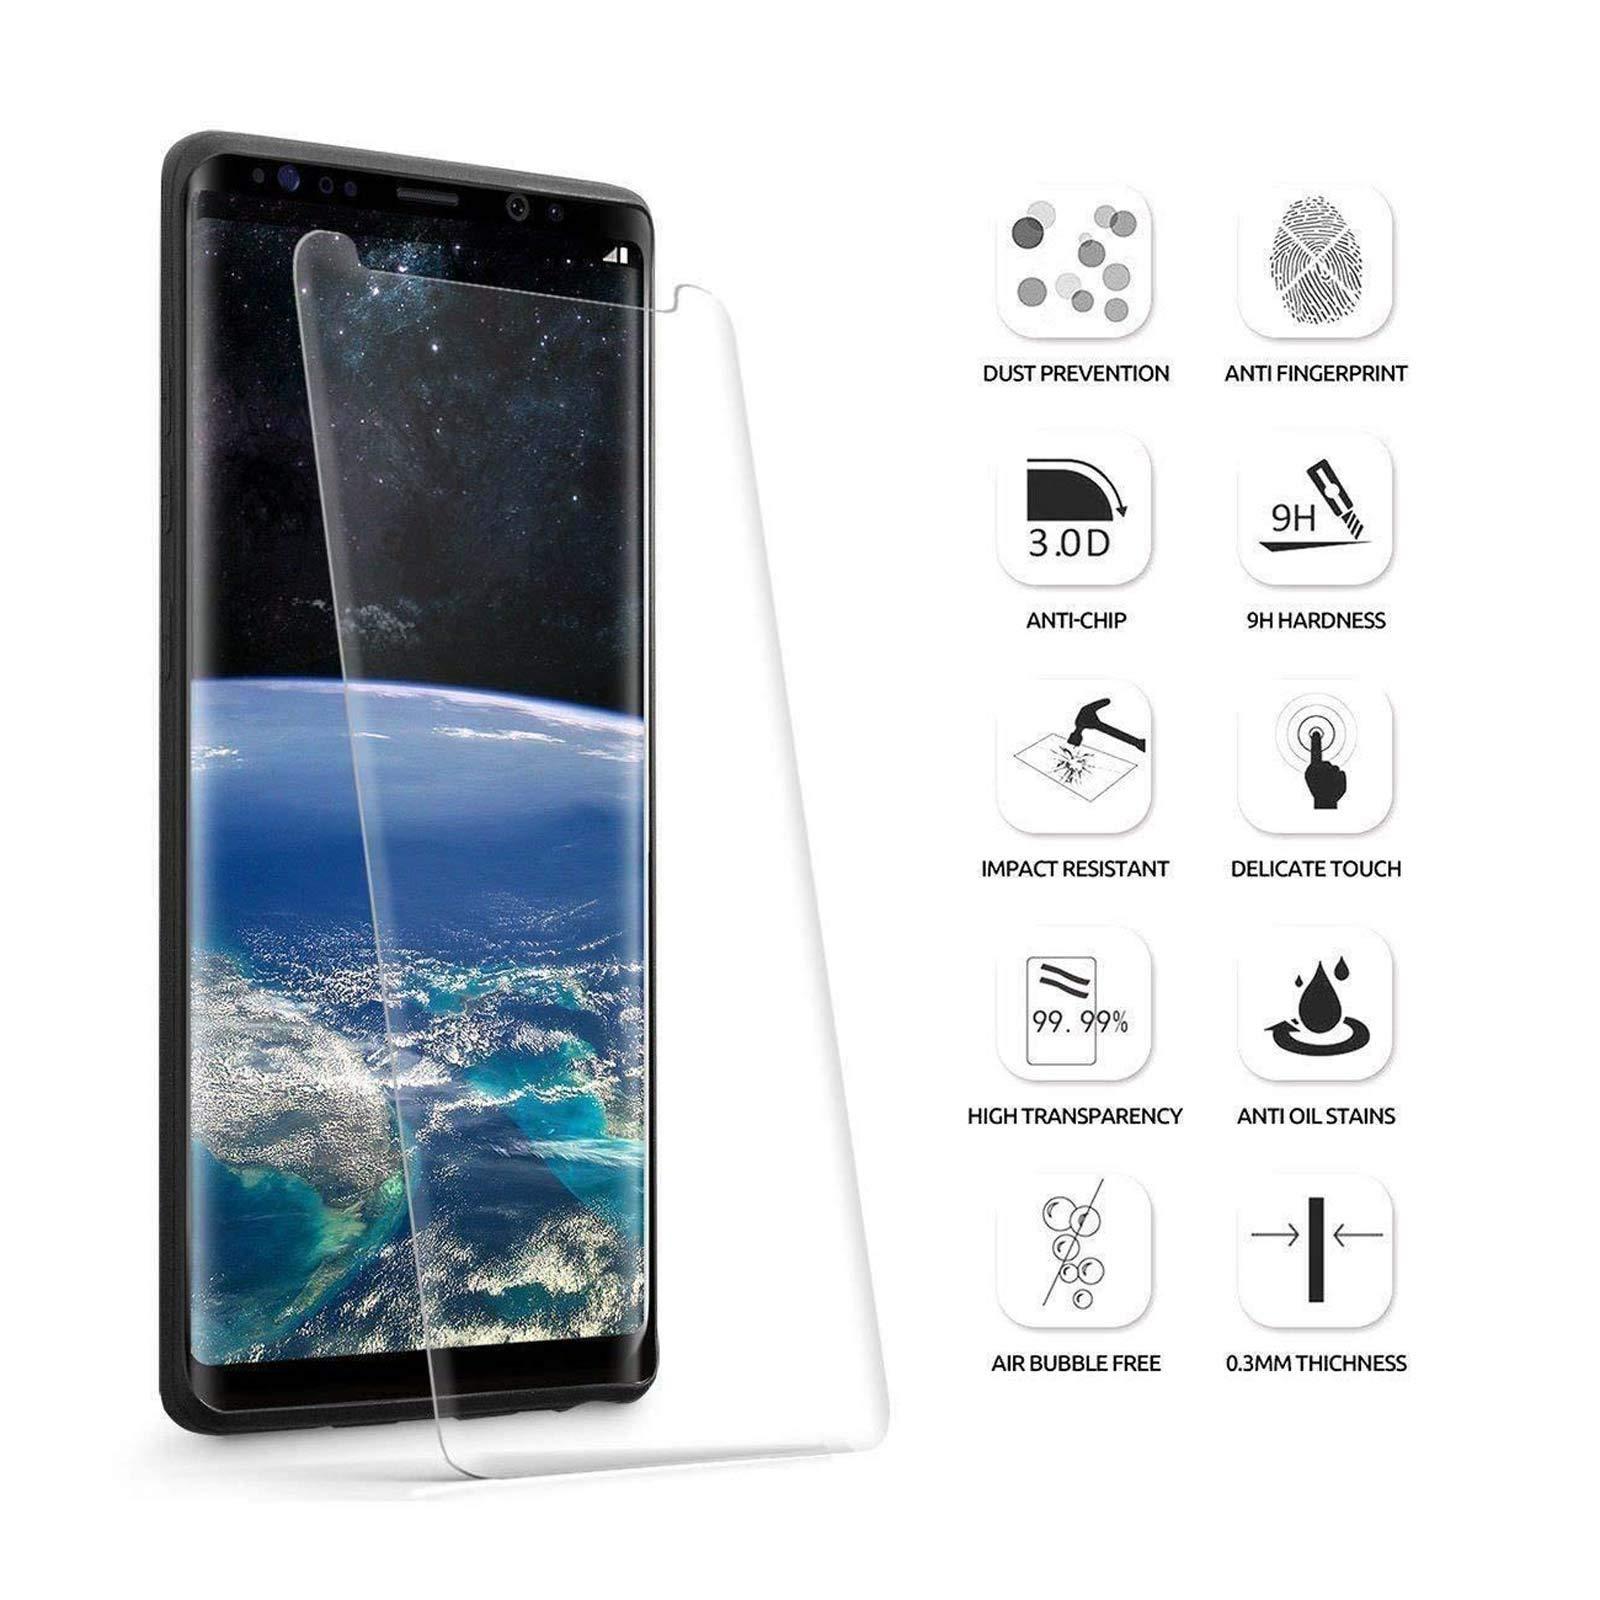 LINCIVIUS  Ecran Verre Trempé Samsung Galaxy Note 9, Vitre Protection Ecran Rigide intégral Bord à Bord, [Compatible avec Une Coque] - Transparent